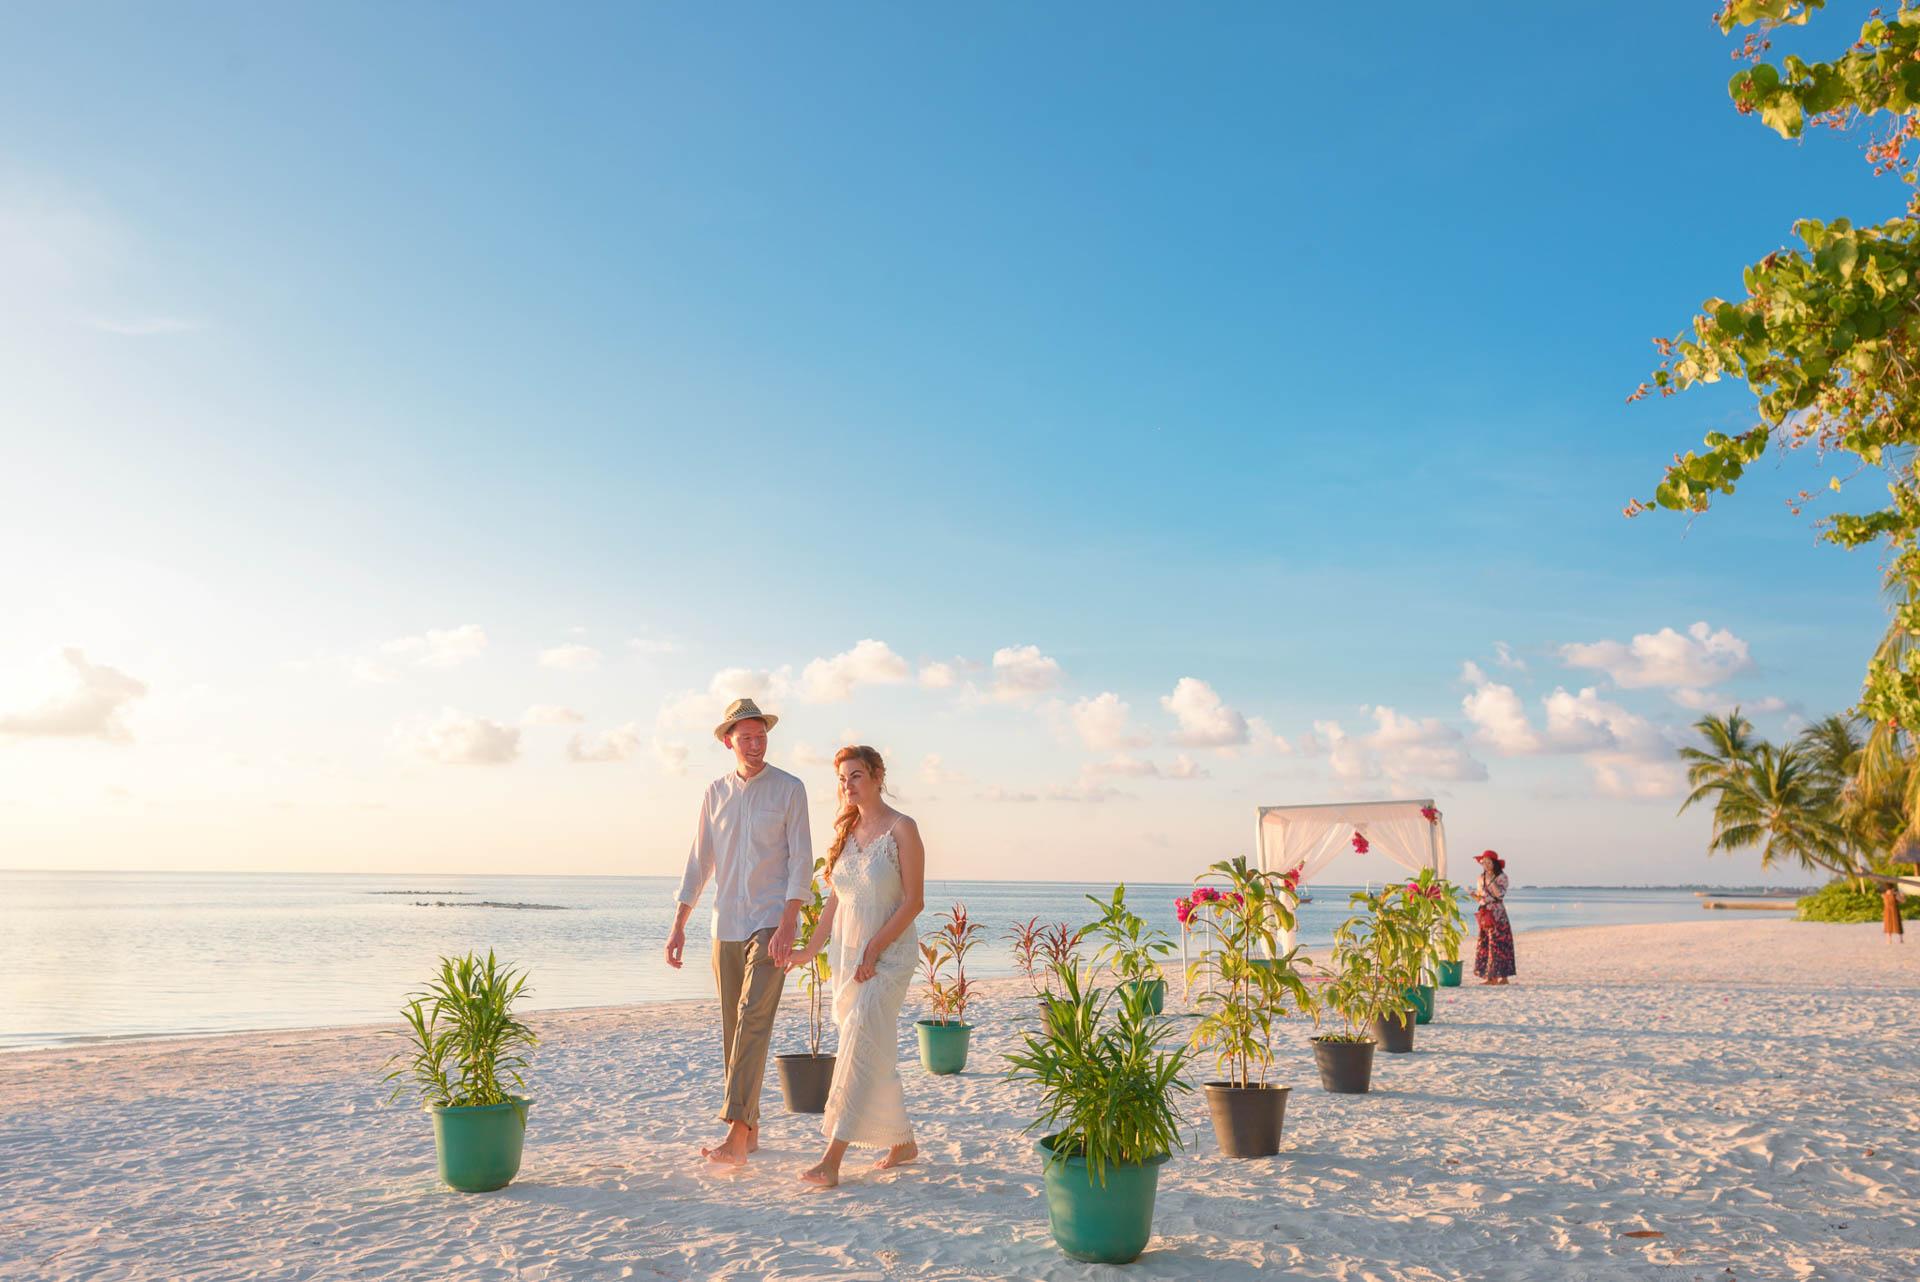 Heike Michaels Beach Wedding in Maldives 5